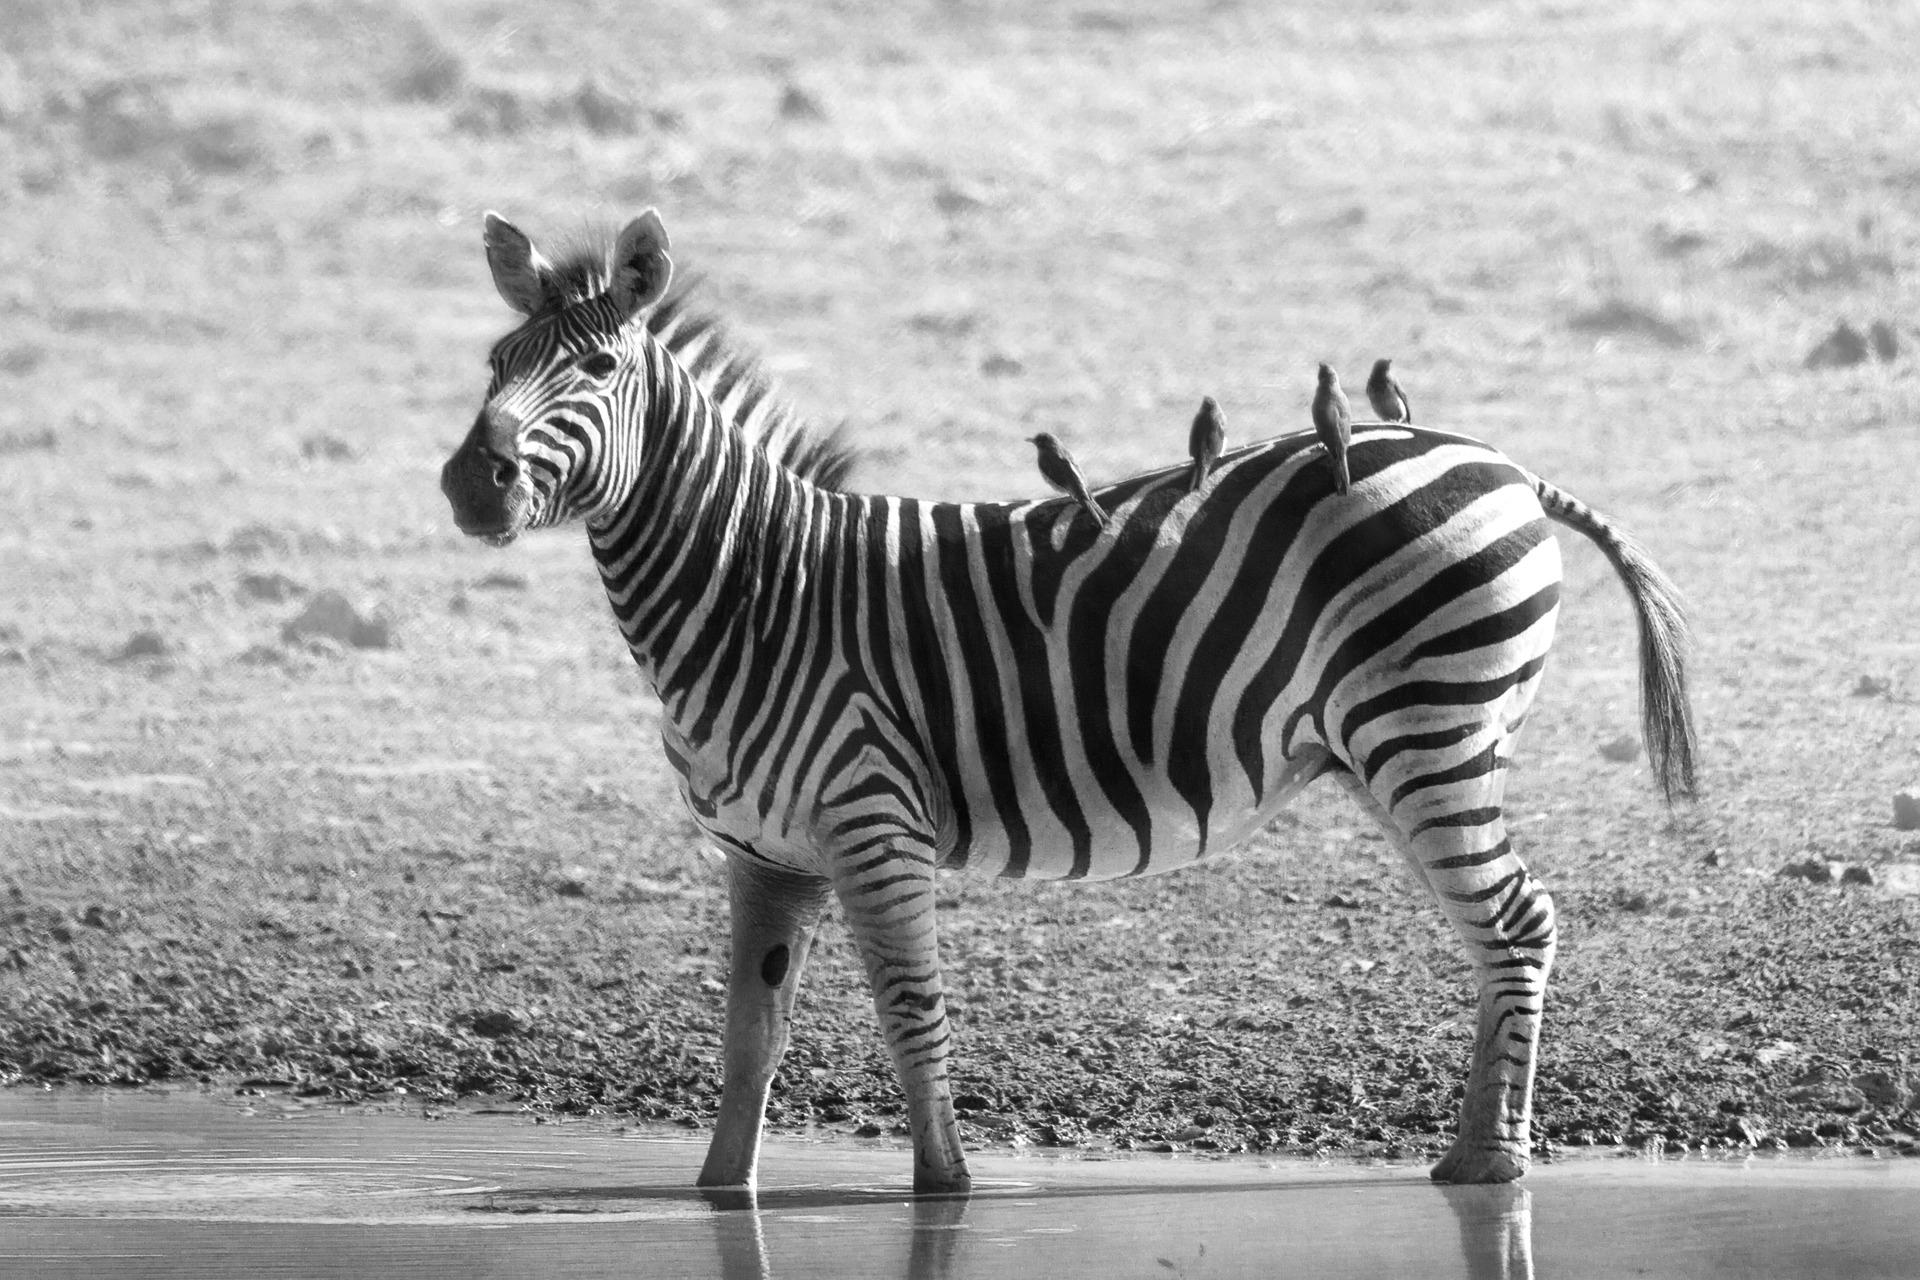 zebra-1169262_1920